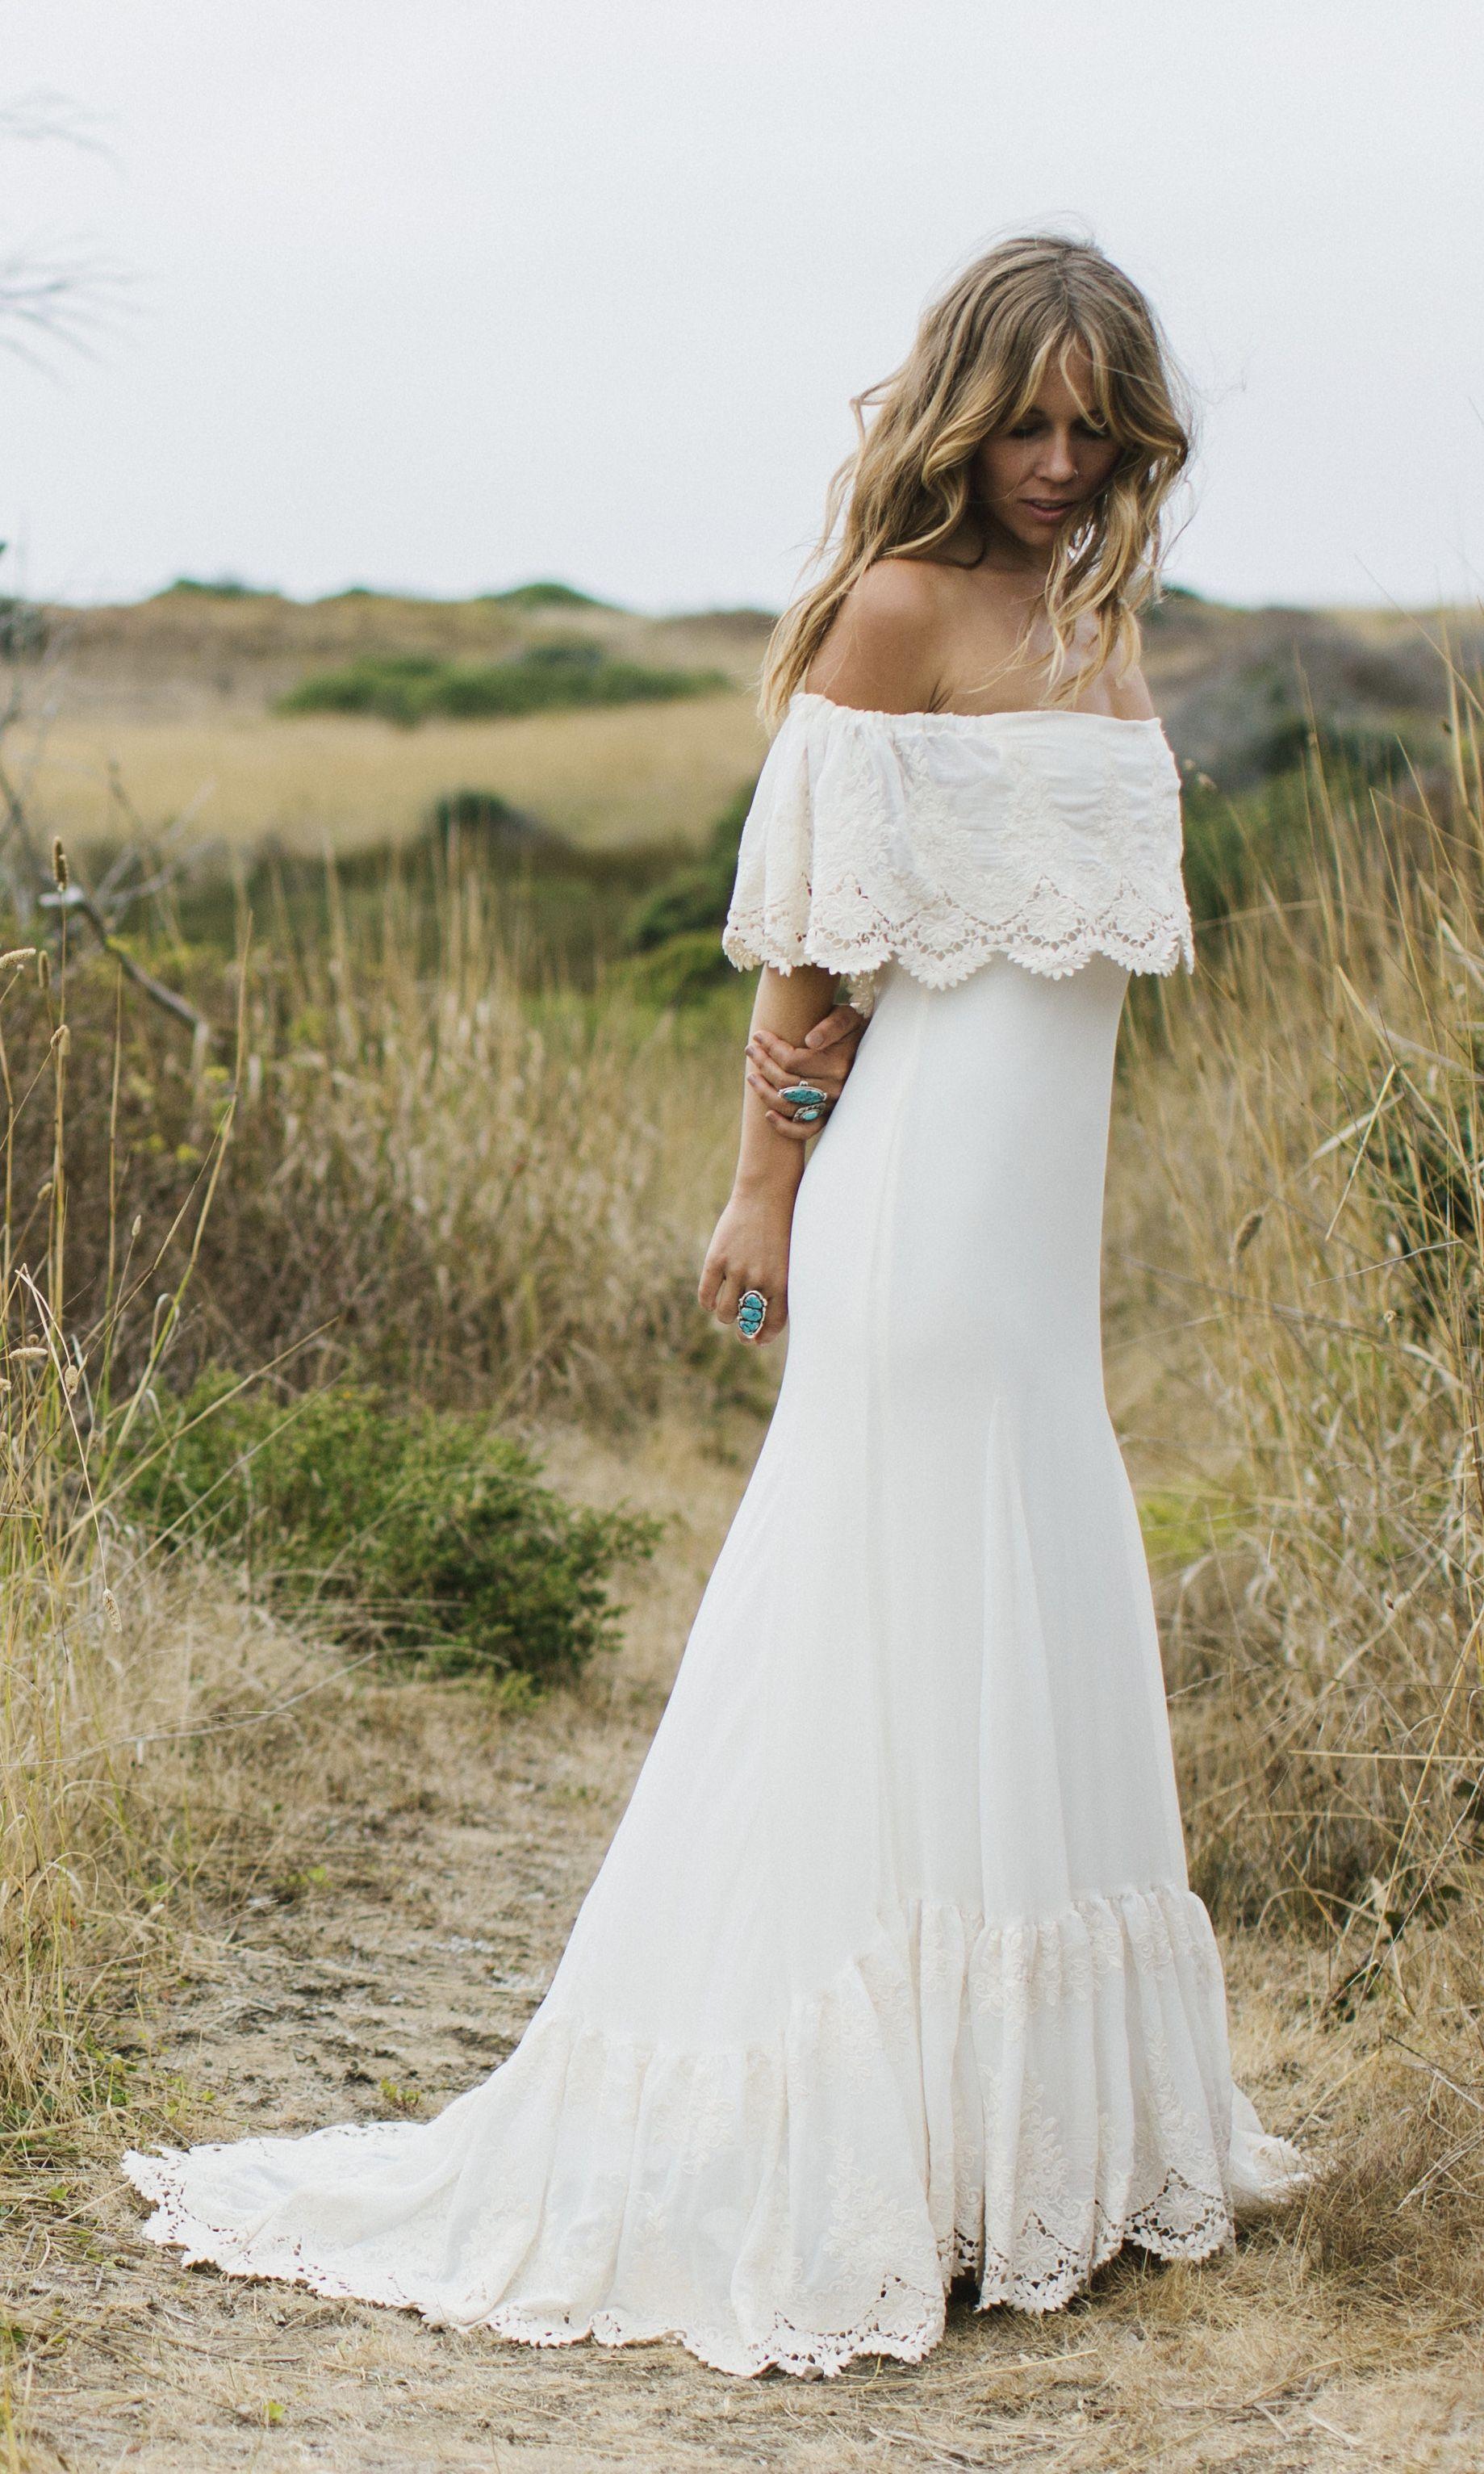 Image result for bohemian wedding dress wedding dresses in